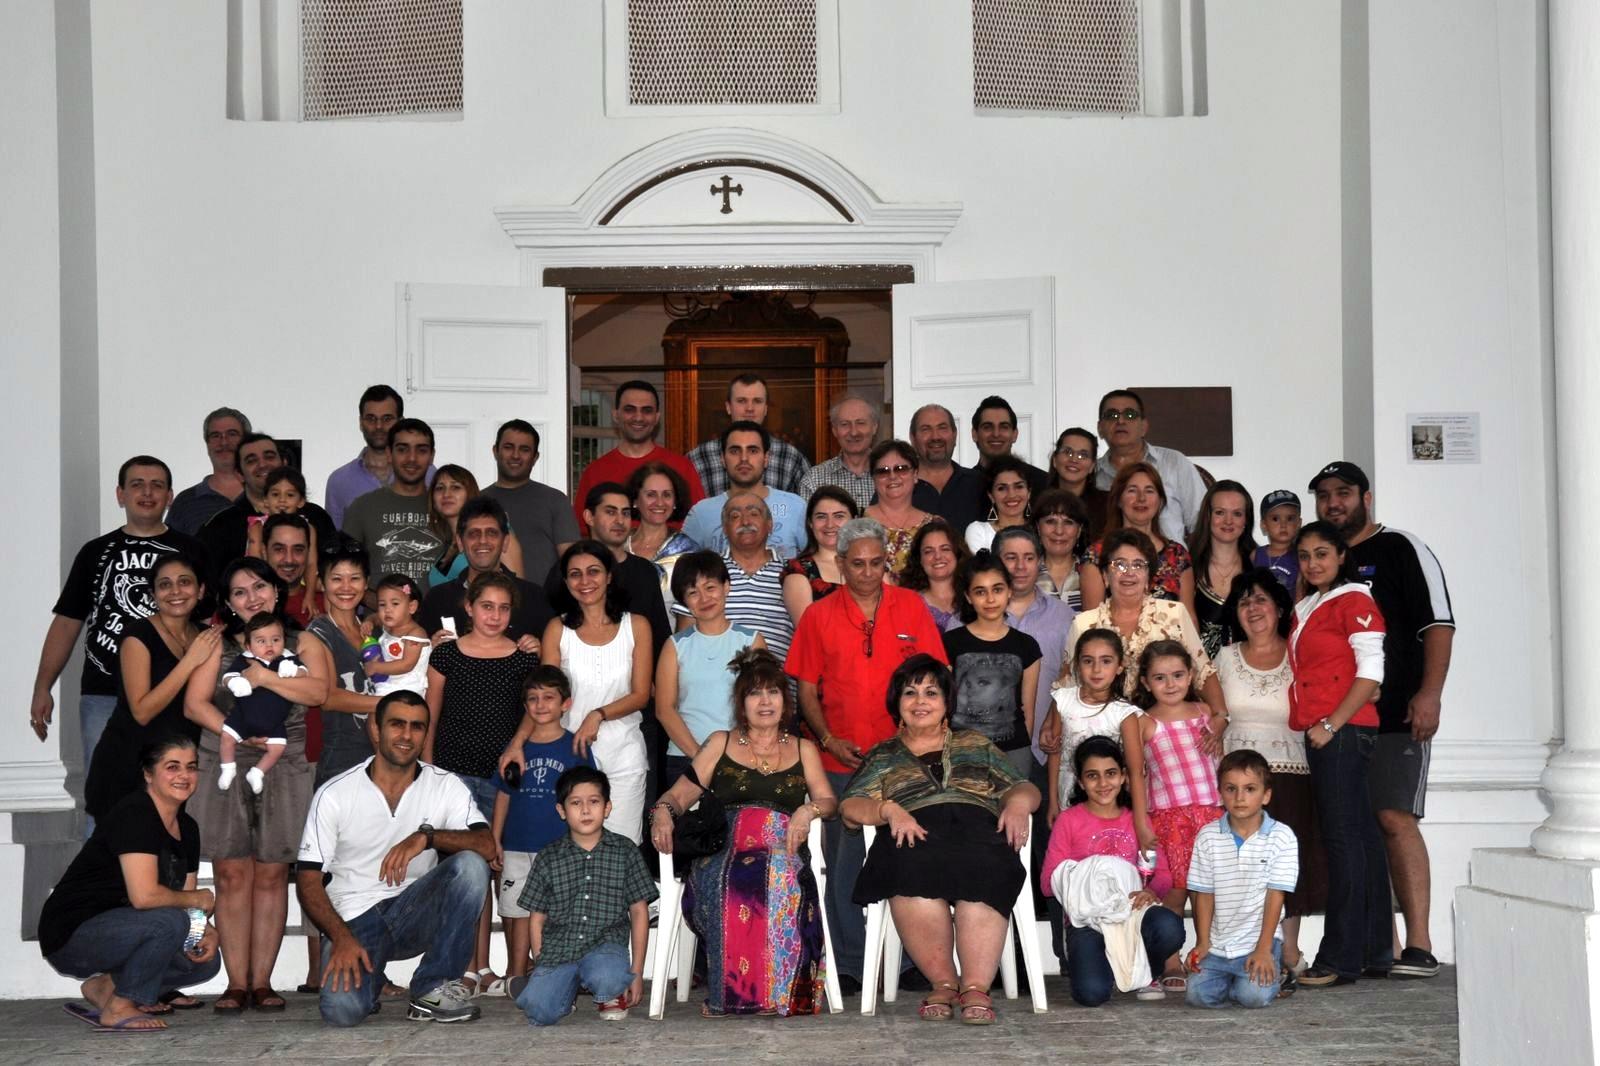 2011-01-23-armenian-community-singapore.jpg